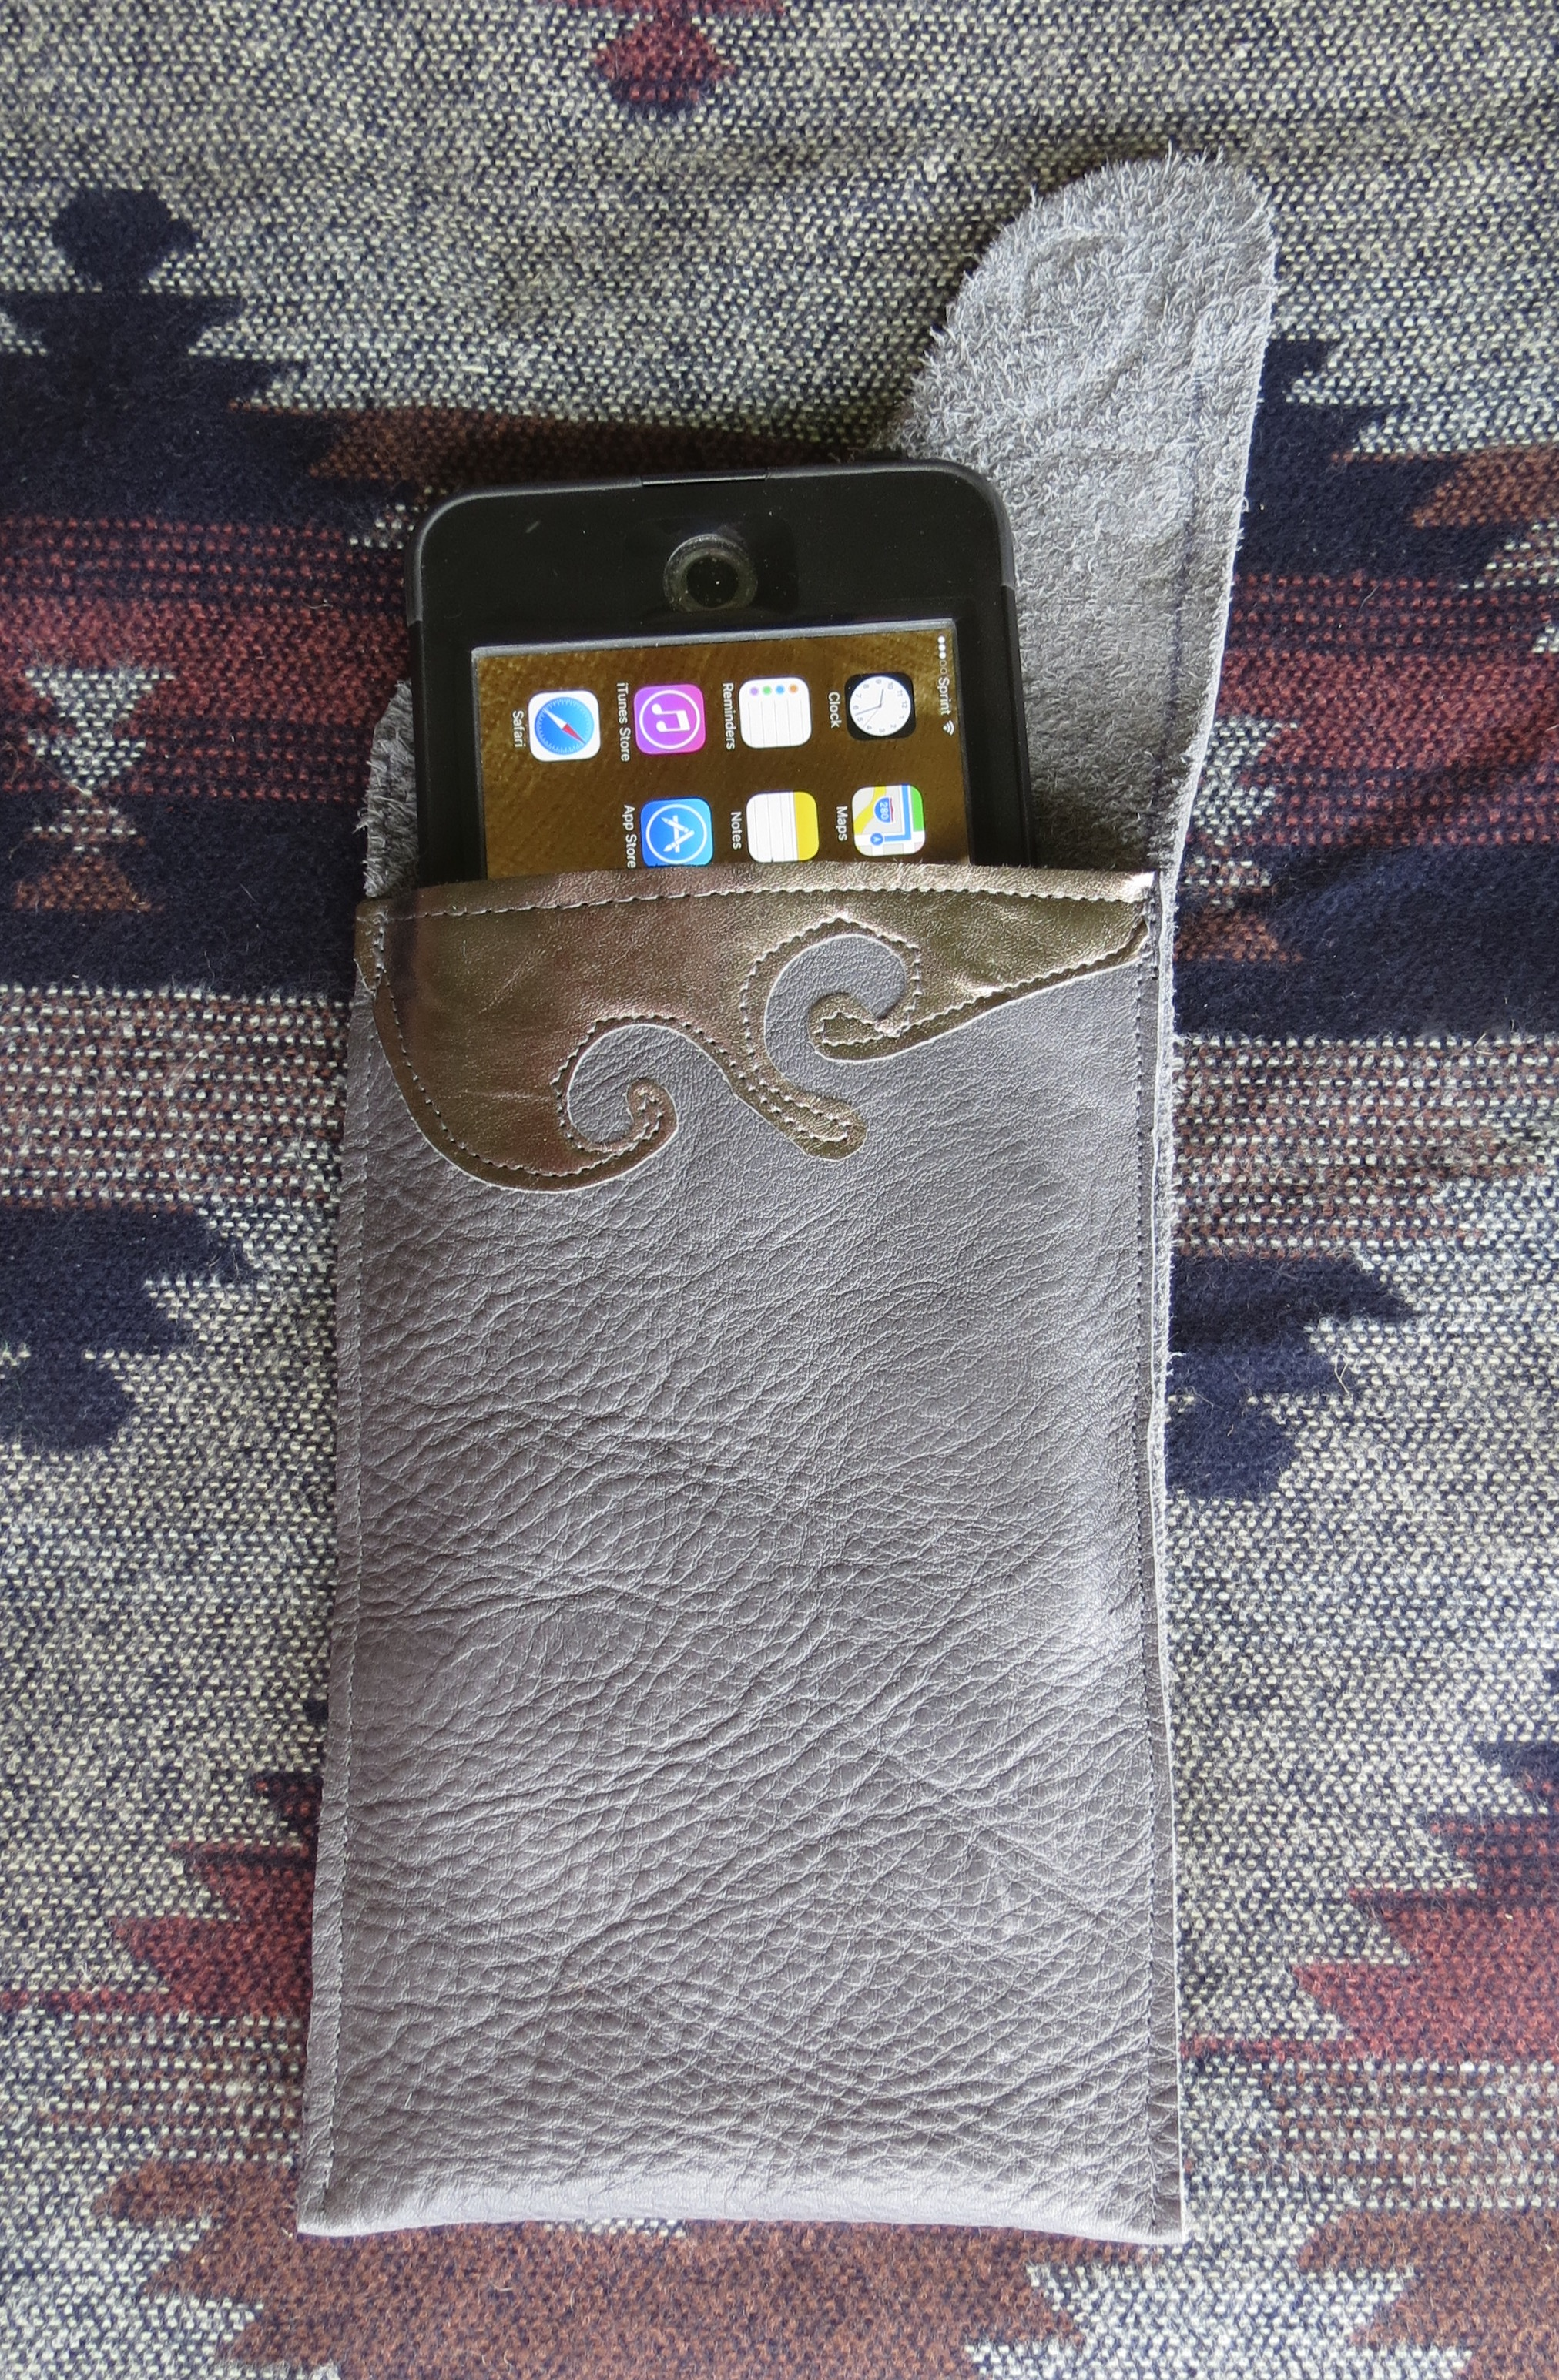 Leather iPhone 6 Plus Case Soft Sleeve for Lifeproof Case – Scottsdale